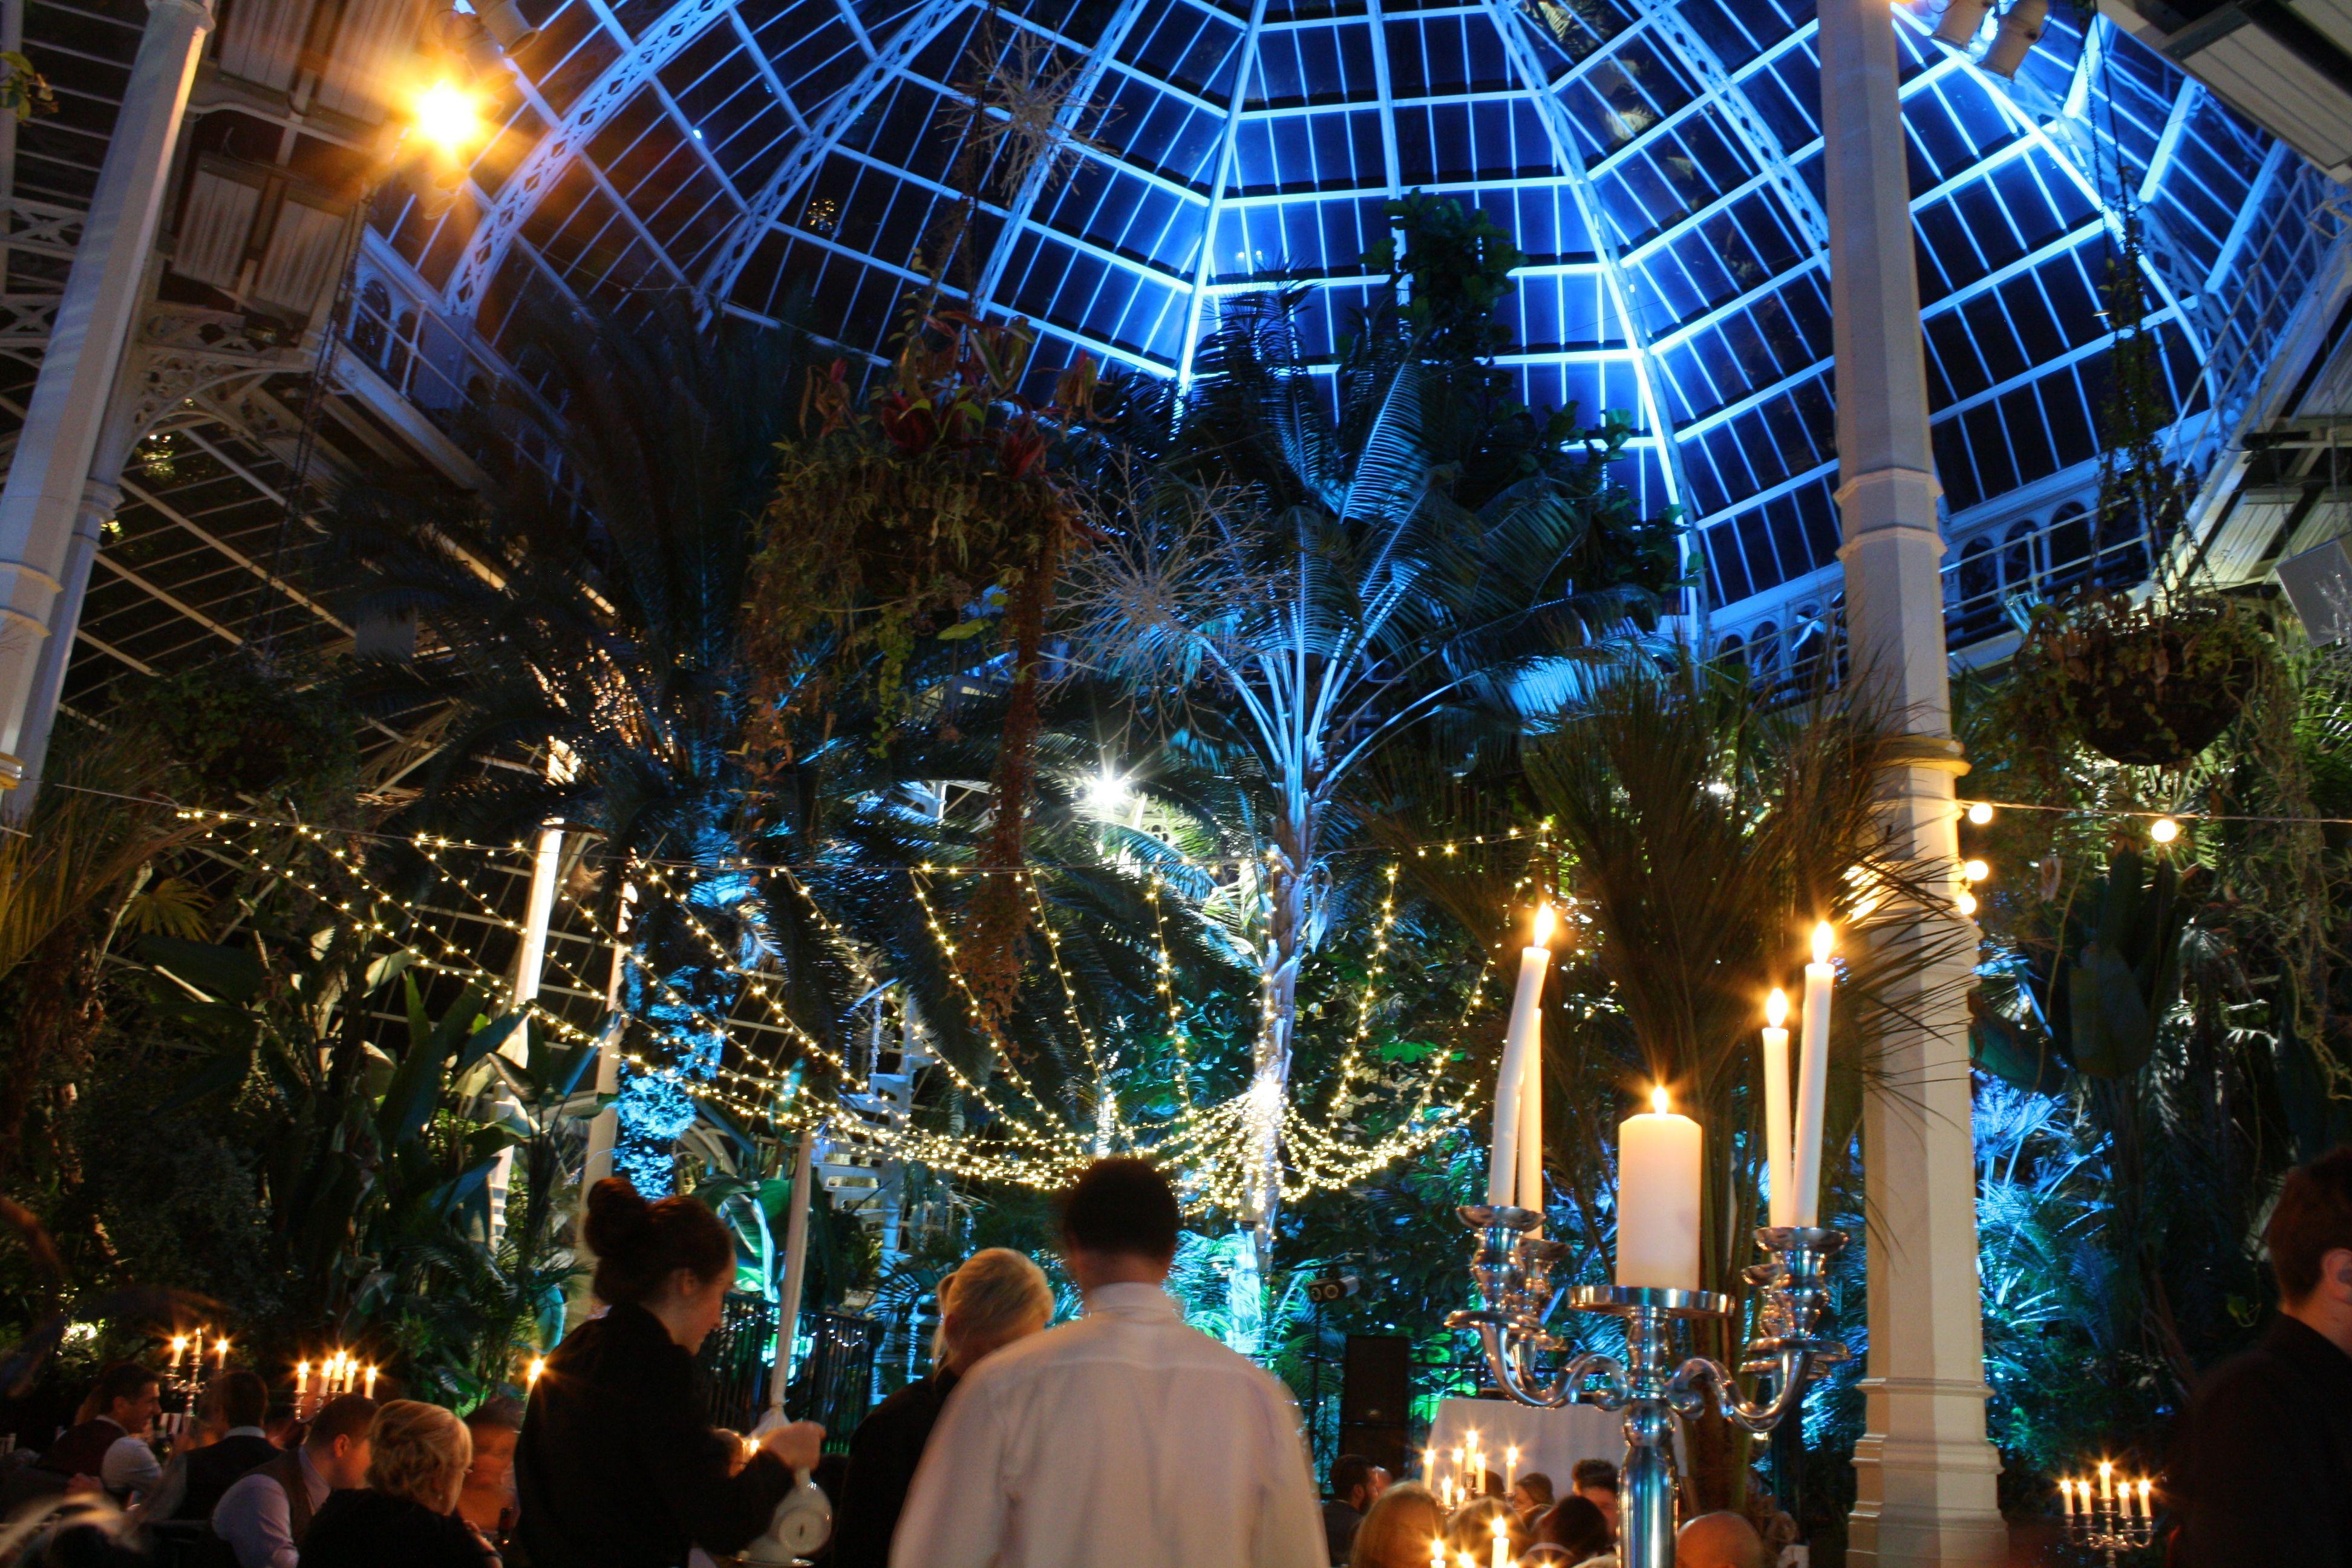 Winter Wedding Lighting Backdrop Sefton Park Palm House